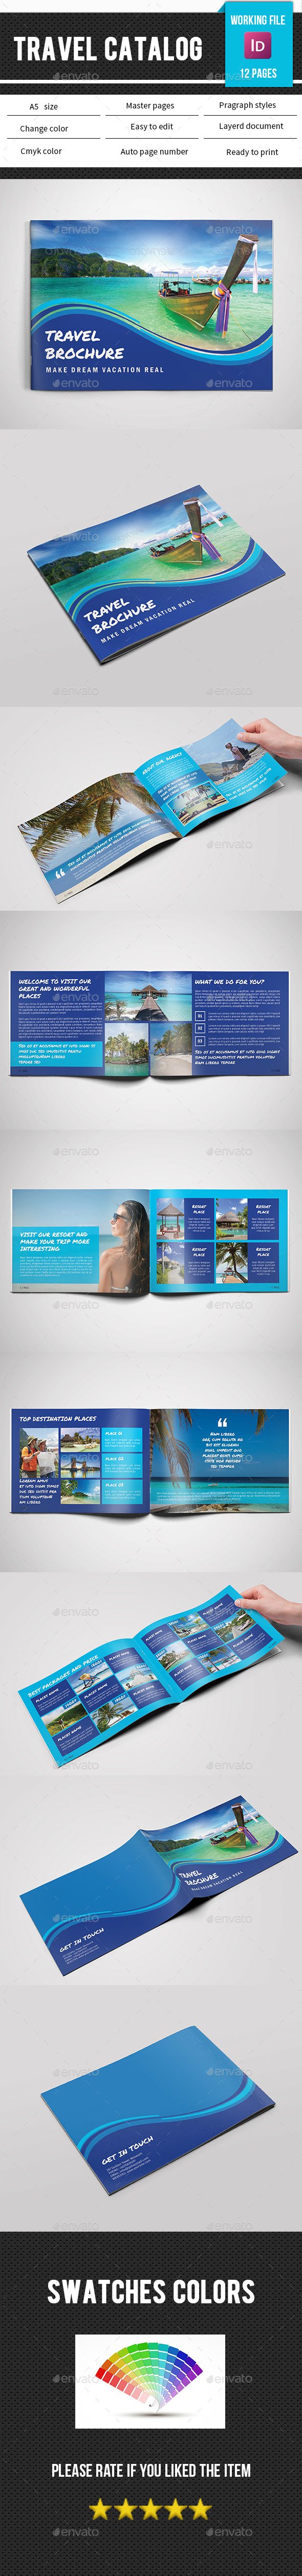 Travel Agency Brochure/Catalog-V194 - Catalogs Brochures